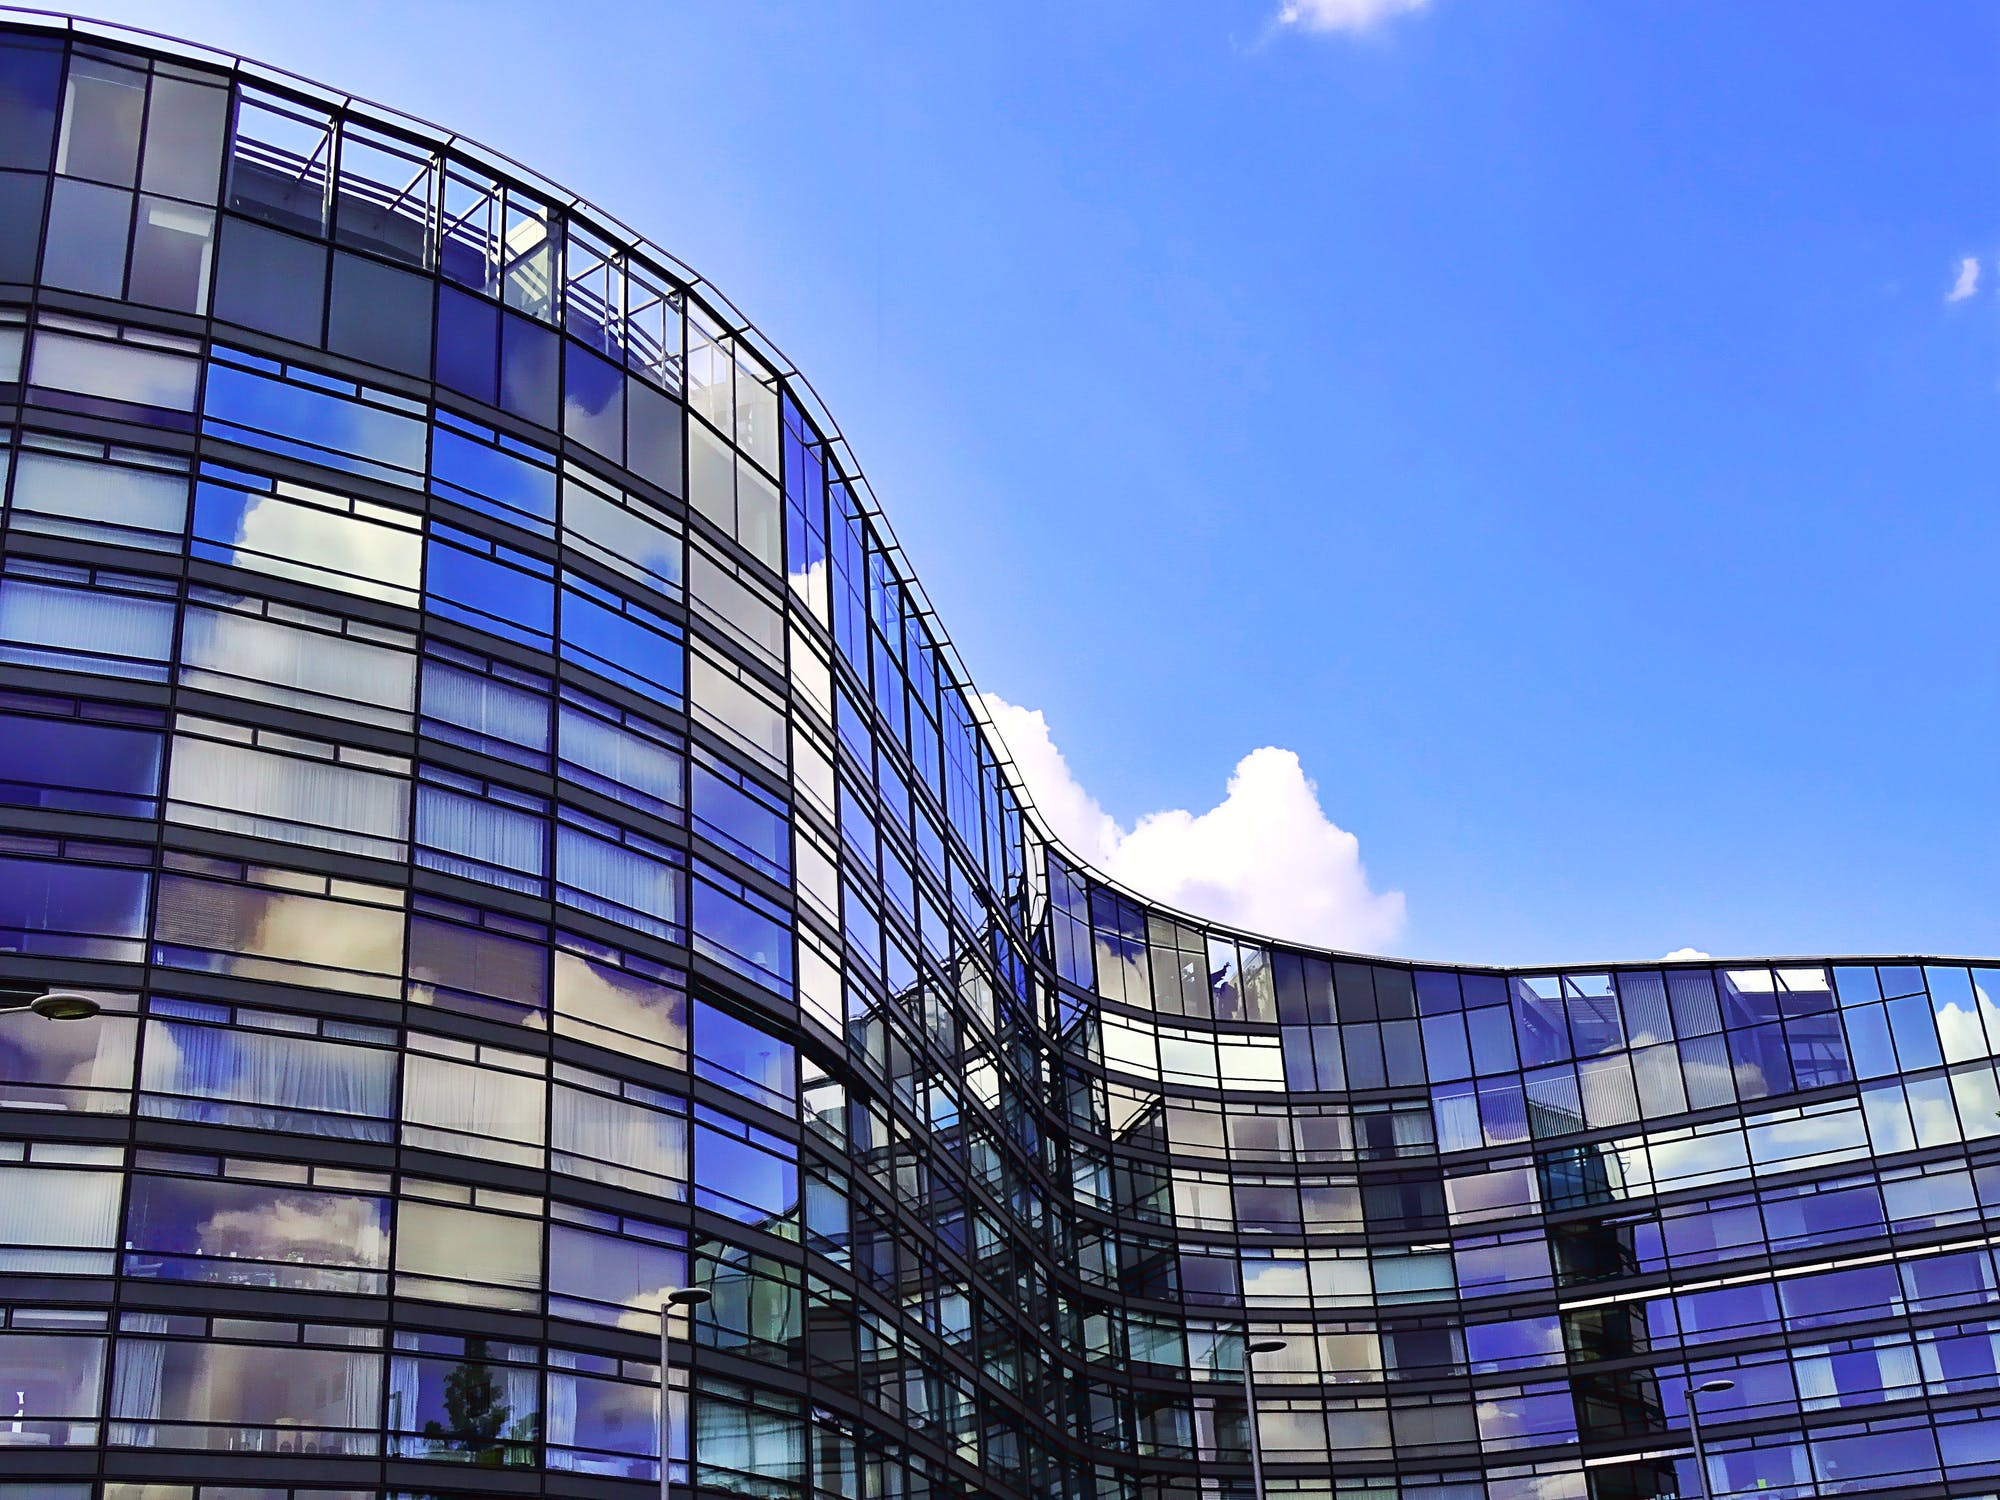 Integrating Smart Building Technology